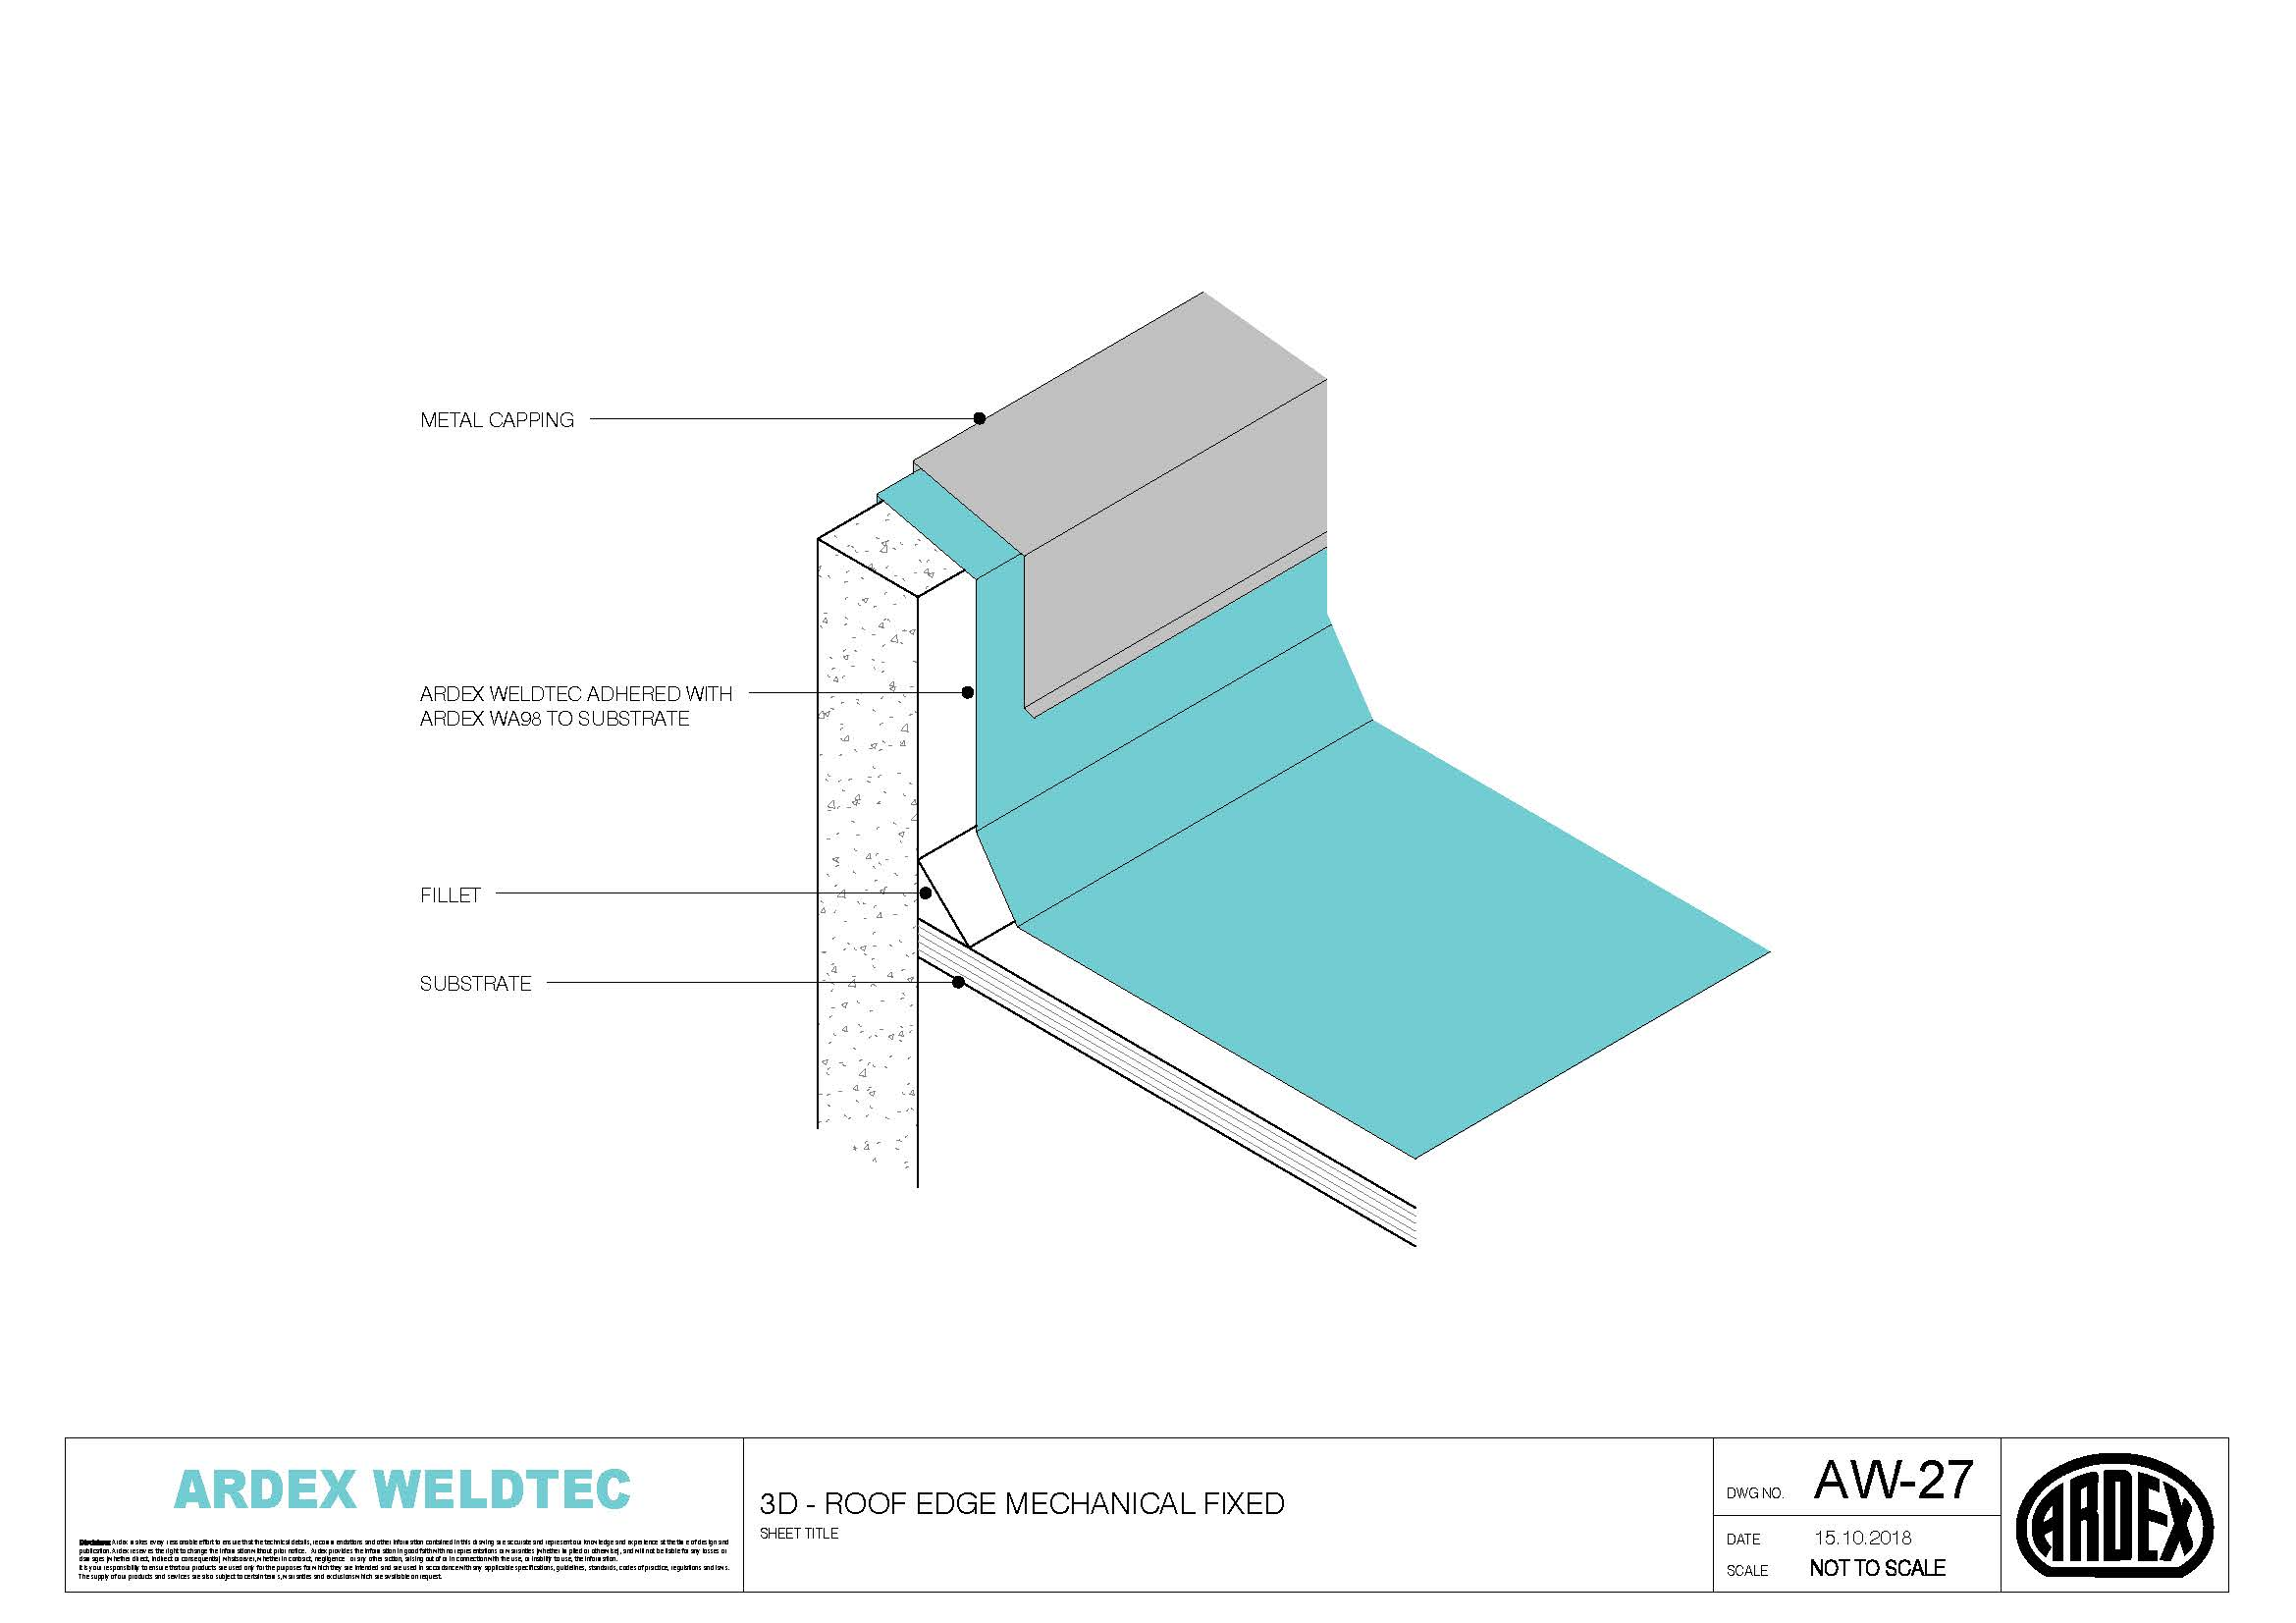 Weldtec Roof Edge Mechanical Fixed